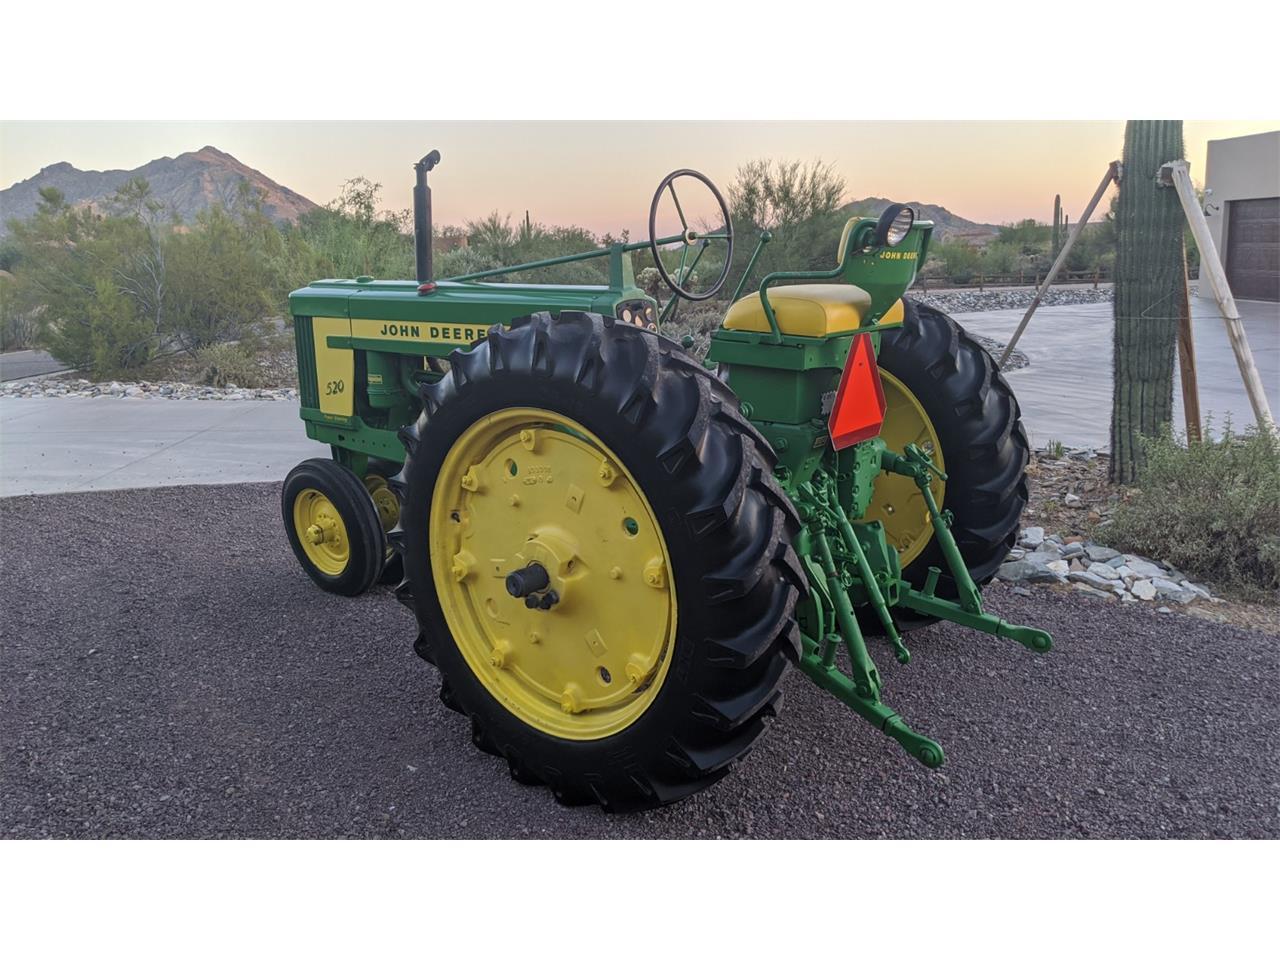 1957 John Deere Tractor (CC-1388491) for sale in Cave Creek, Arizona